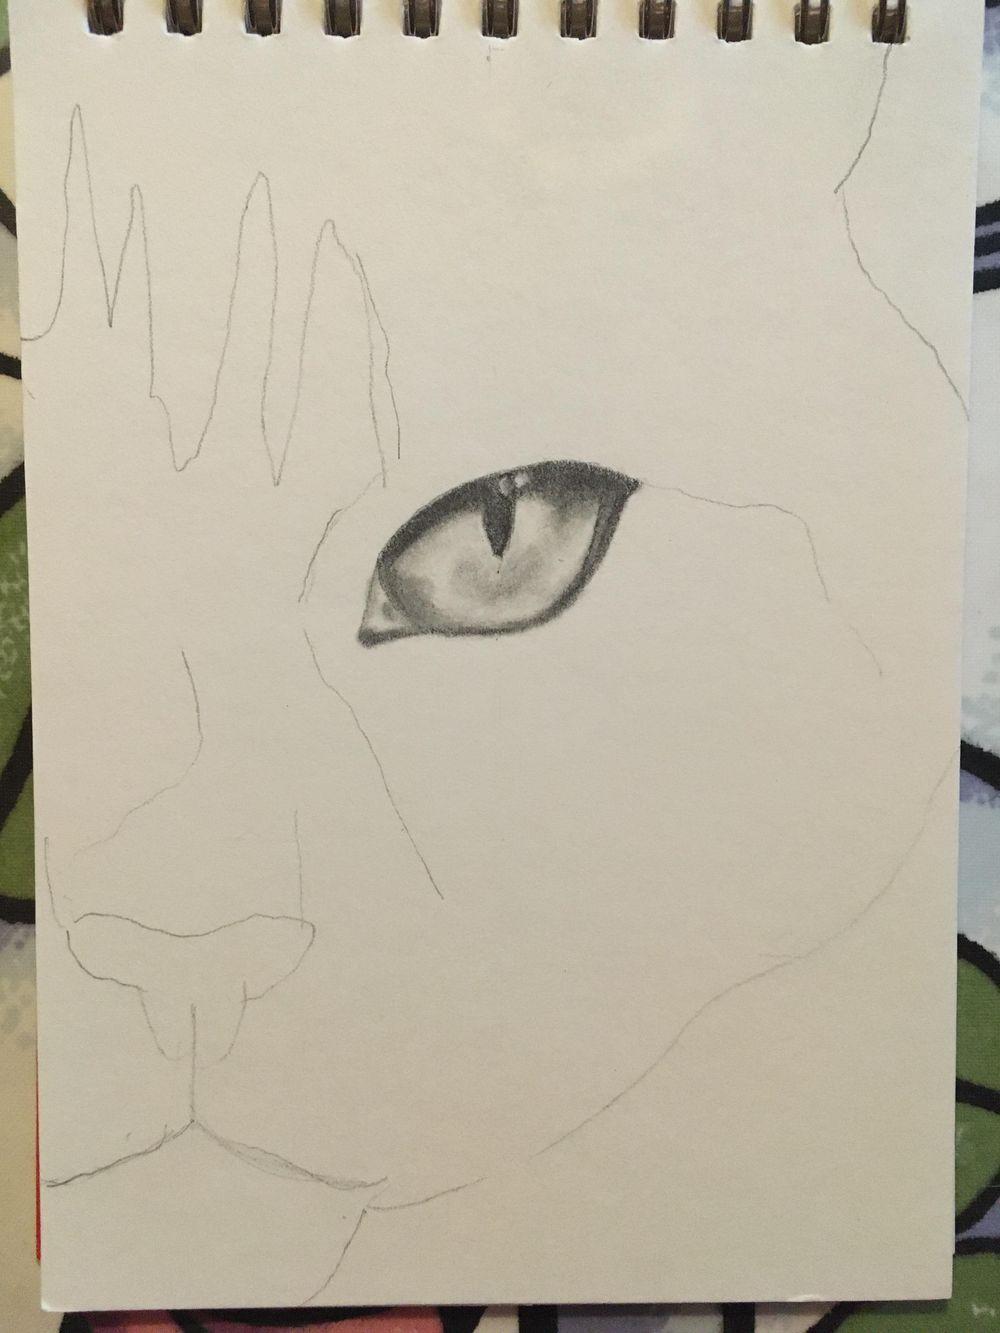 Kitten - image 2 - student project